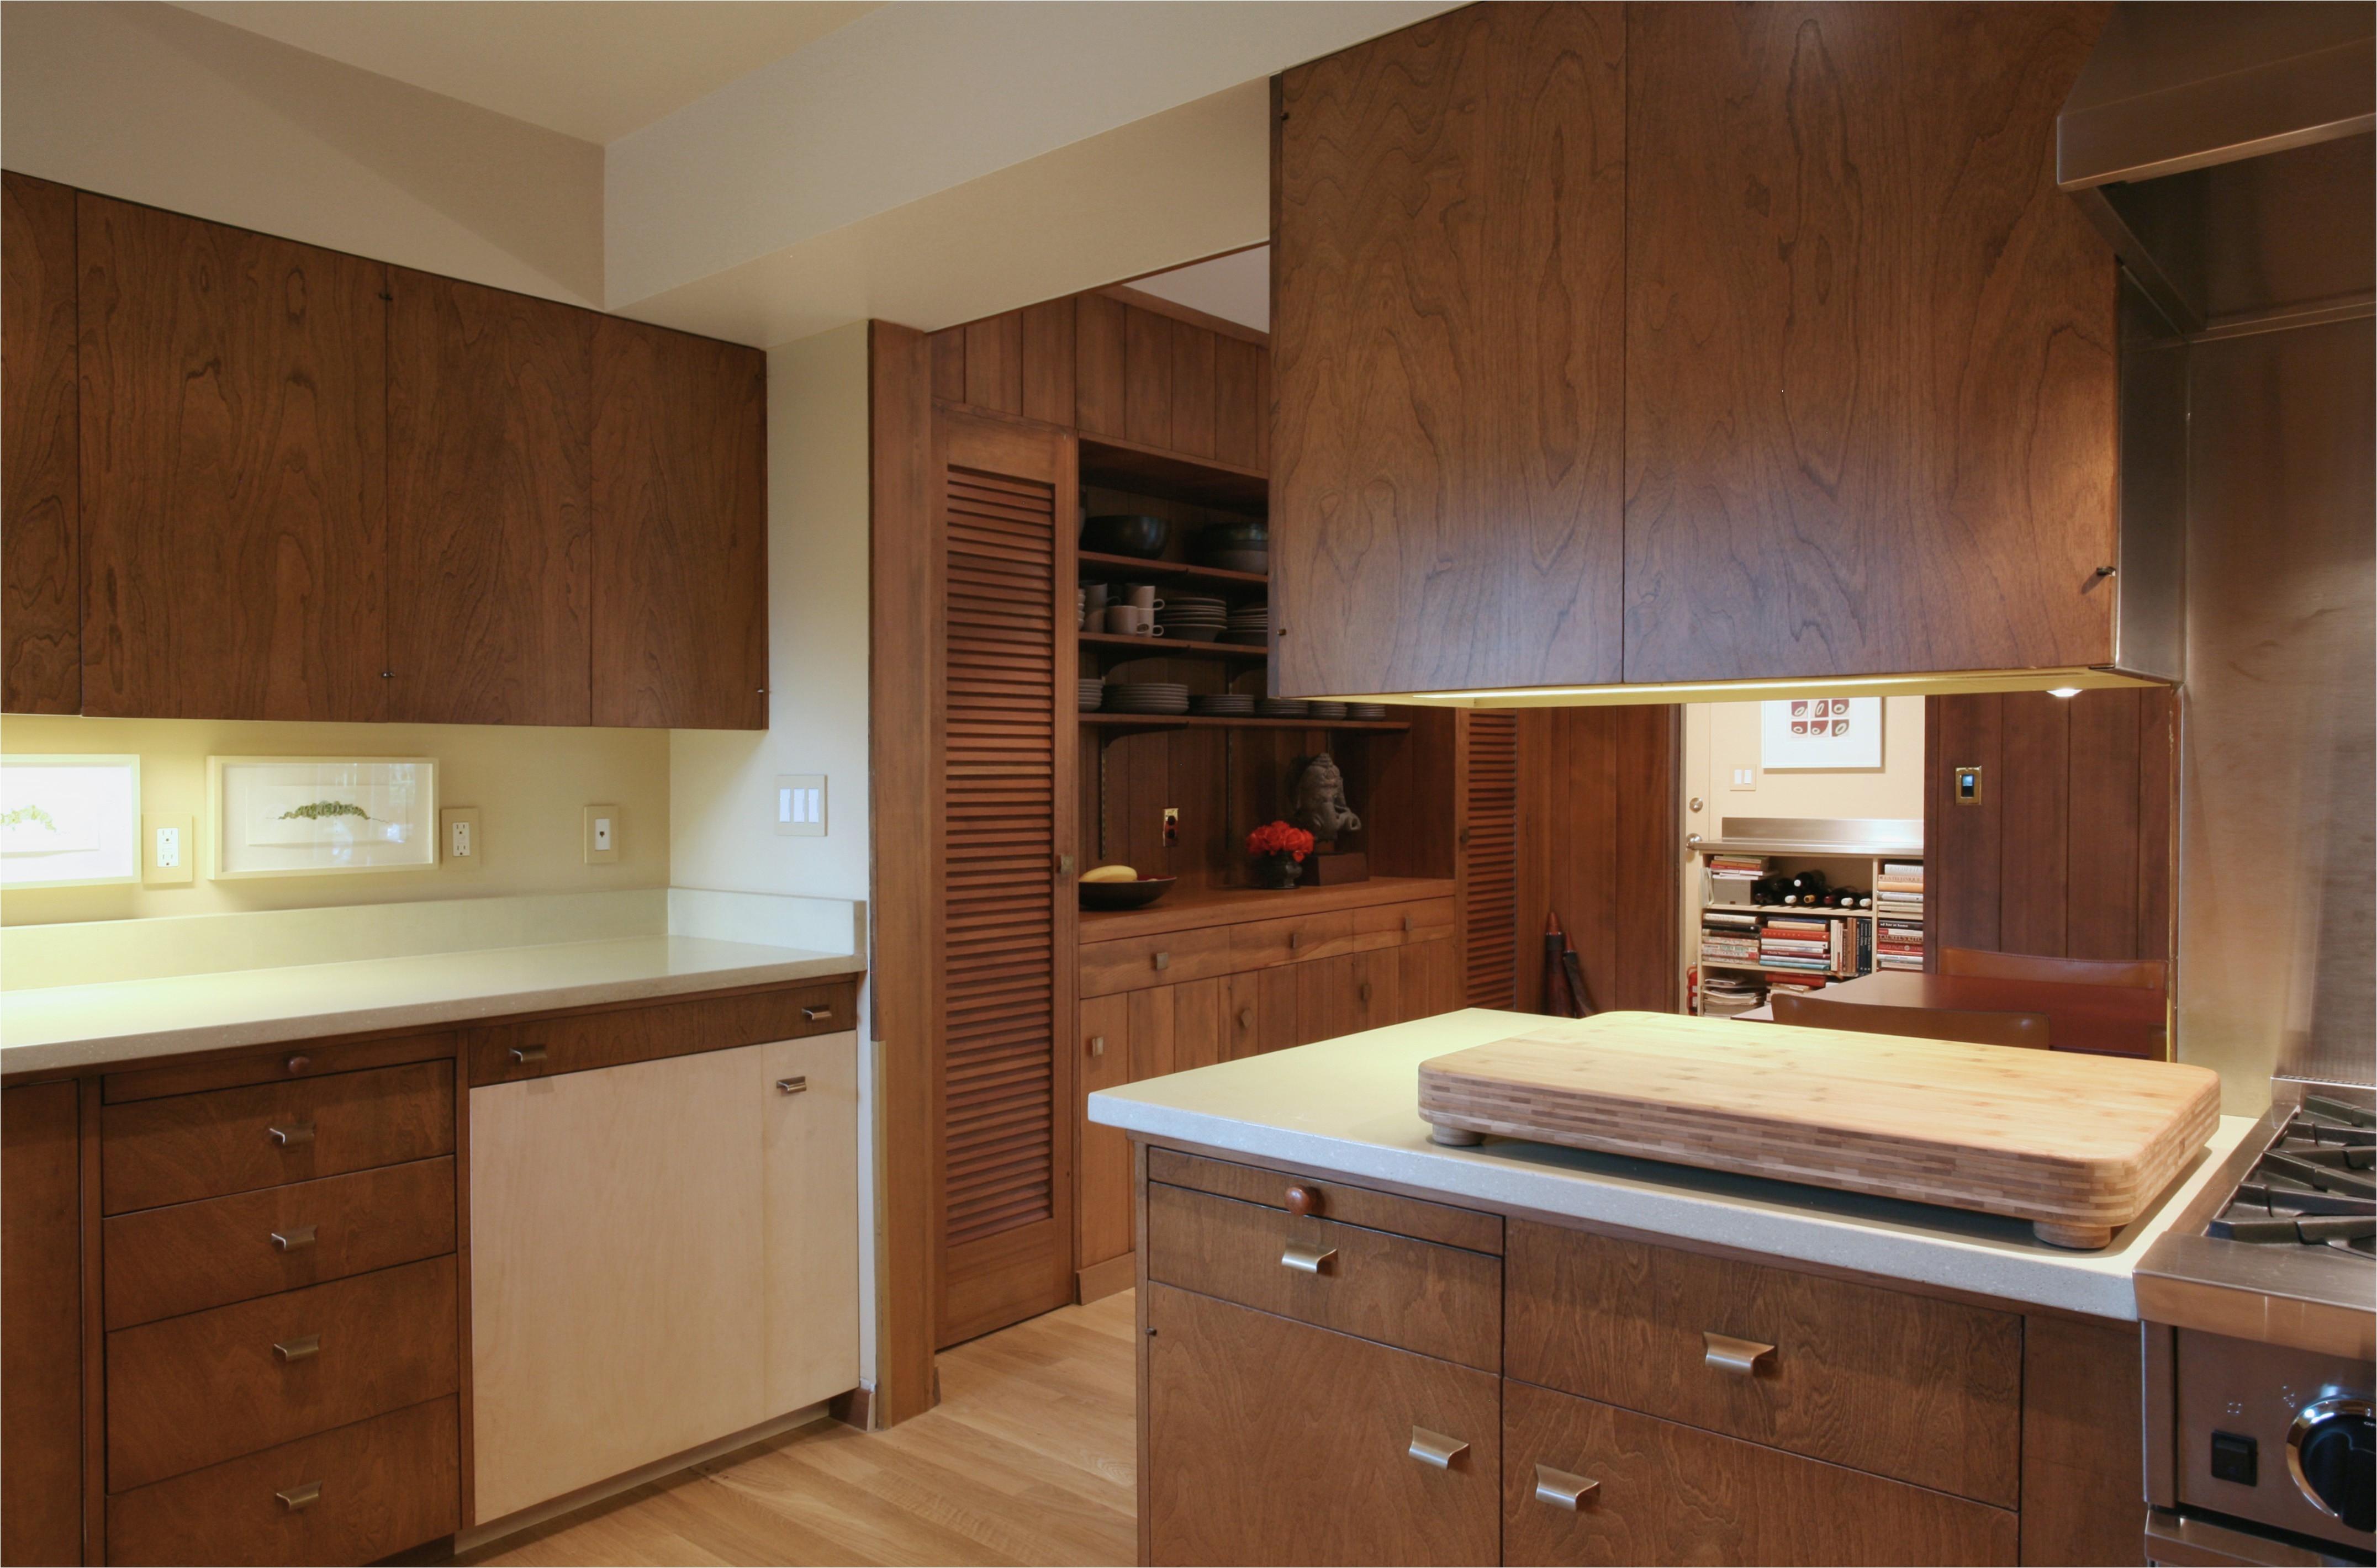 Exceptional Kitchen Modern Design and Modern Kitchen Design Awesome Kitchen 1960s Kitchen 1960s Kitchen 0d